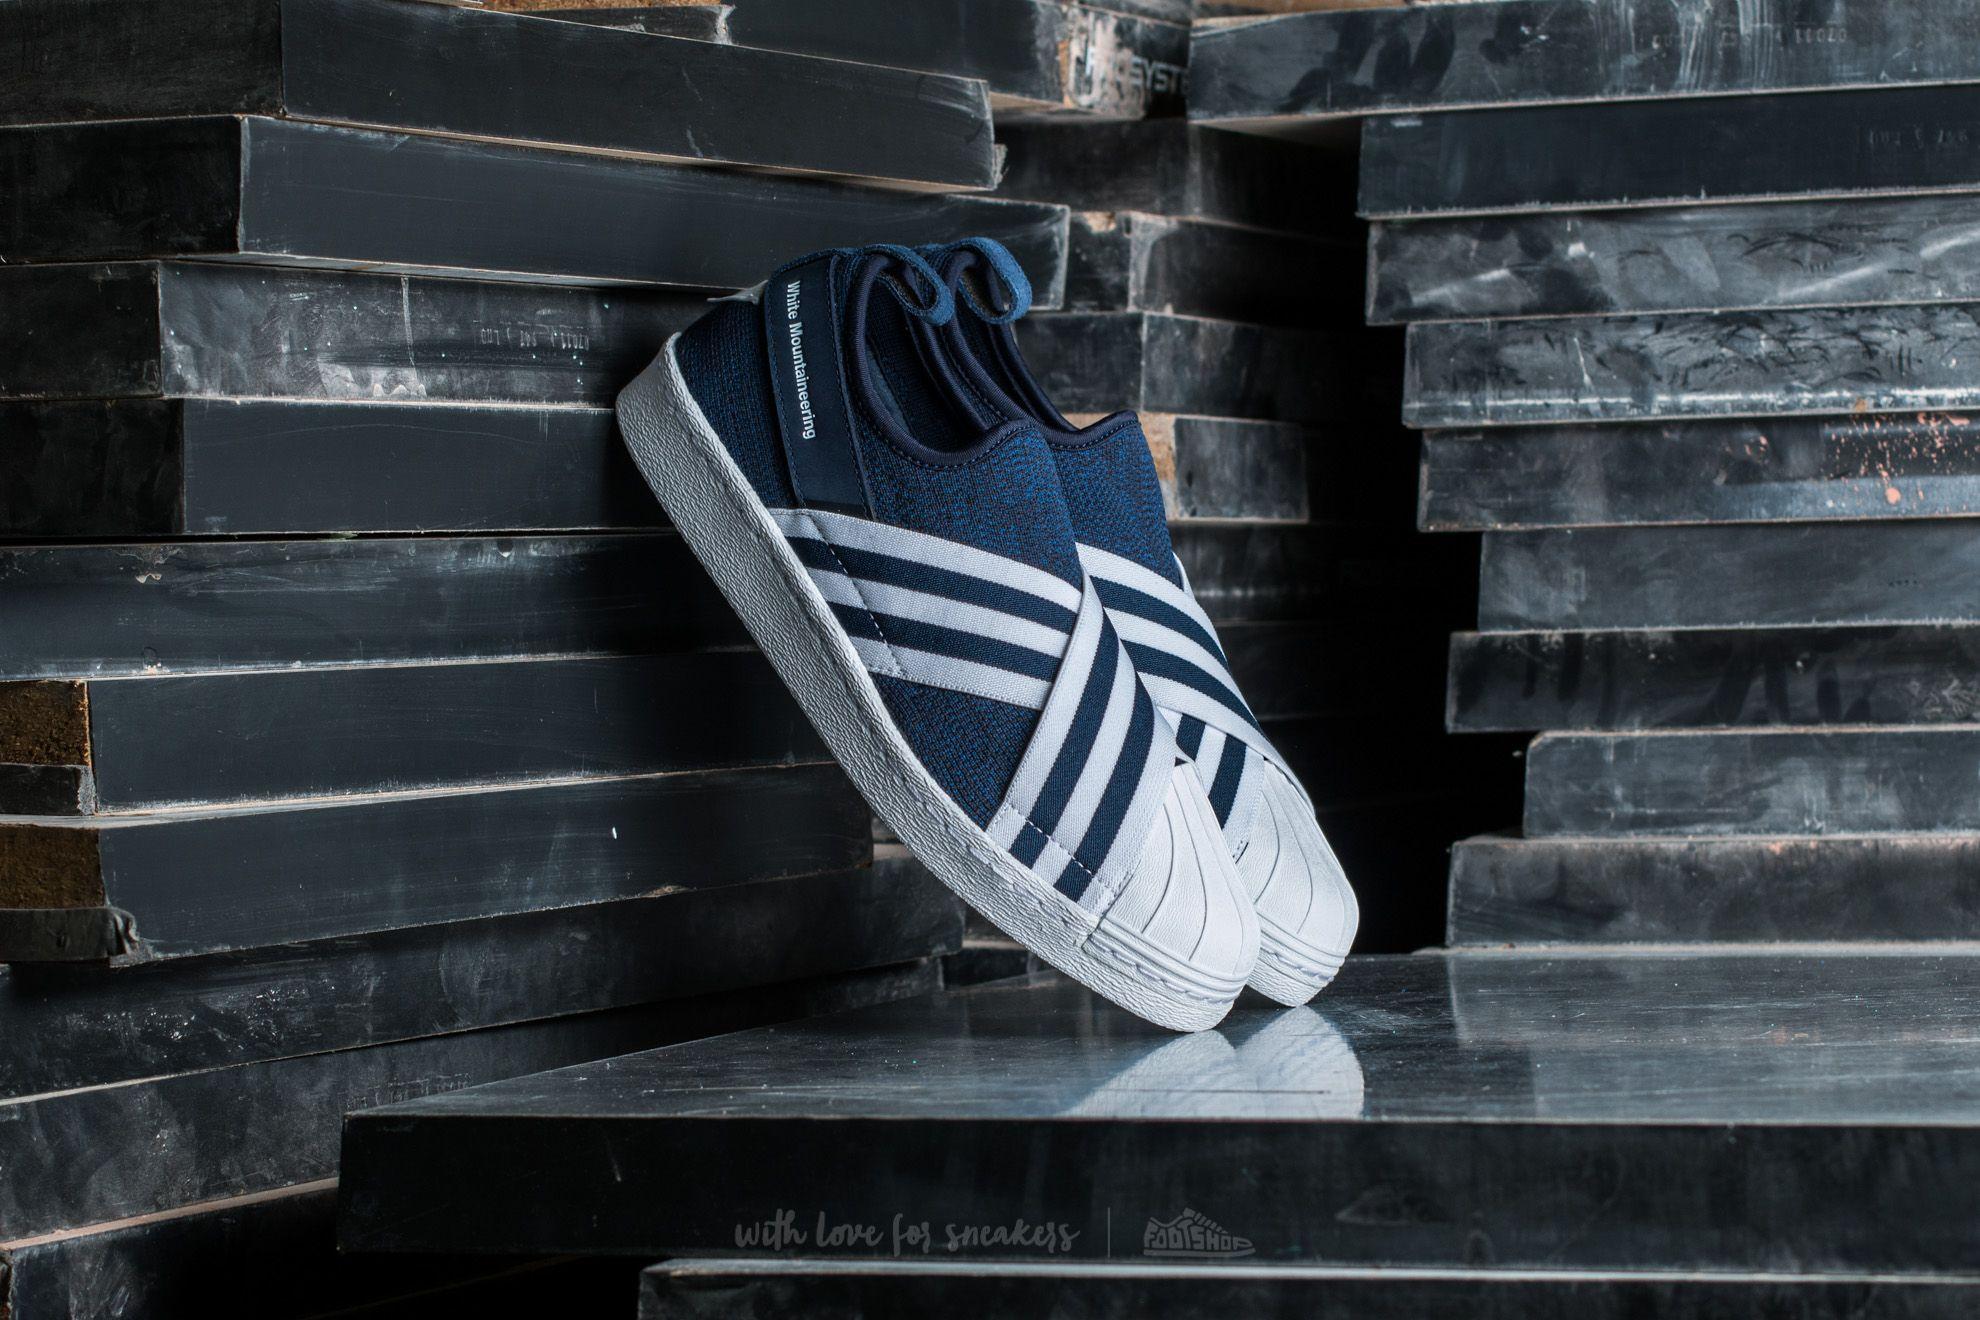 adidas Consortium x White Mountaineering Superstar Slip On Primeknit Collegiate Navy/ Footwear White/ Footwear White - 14382